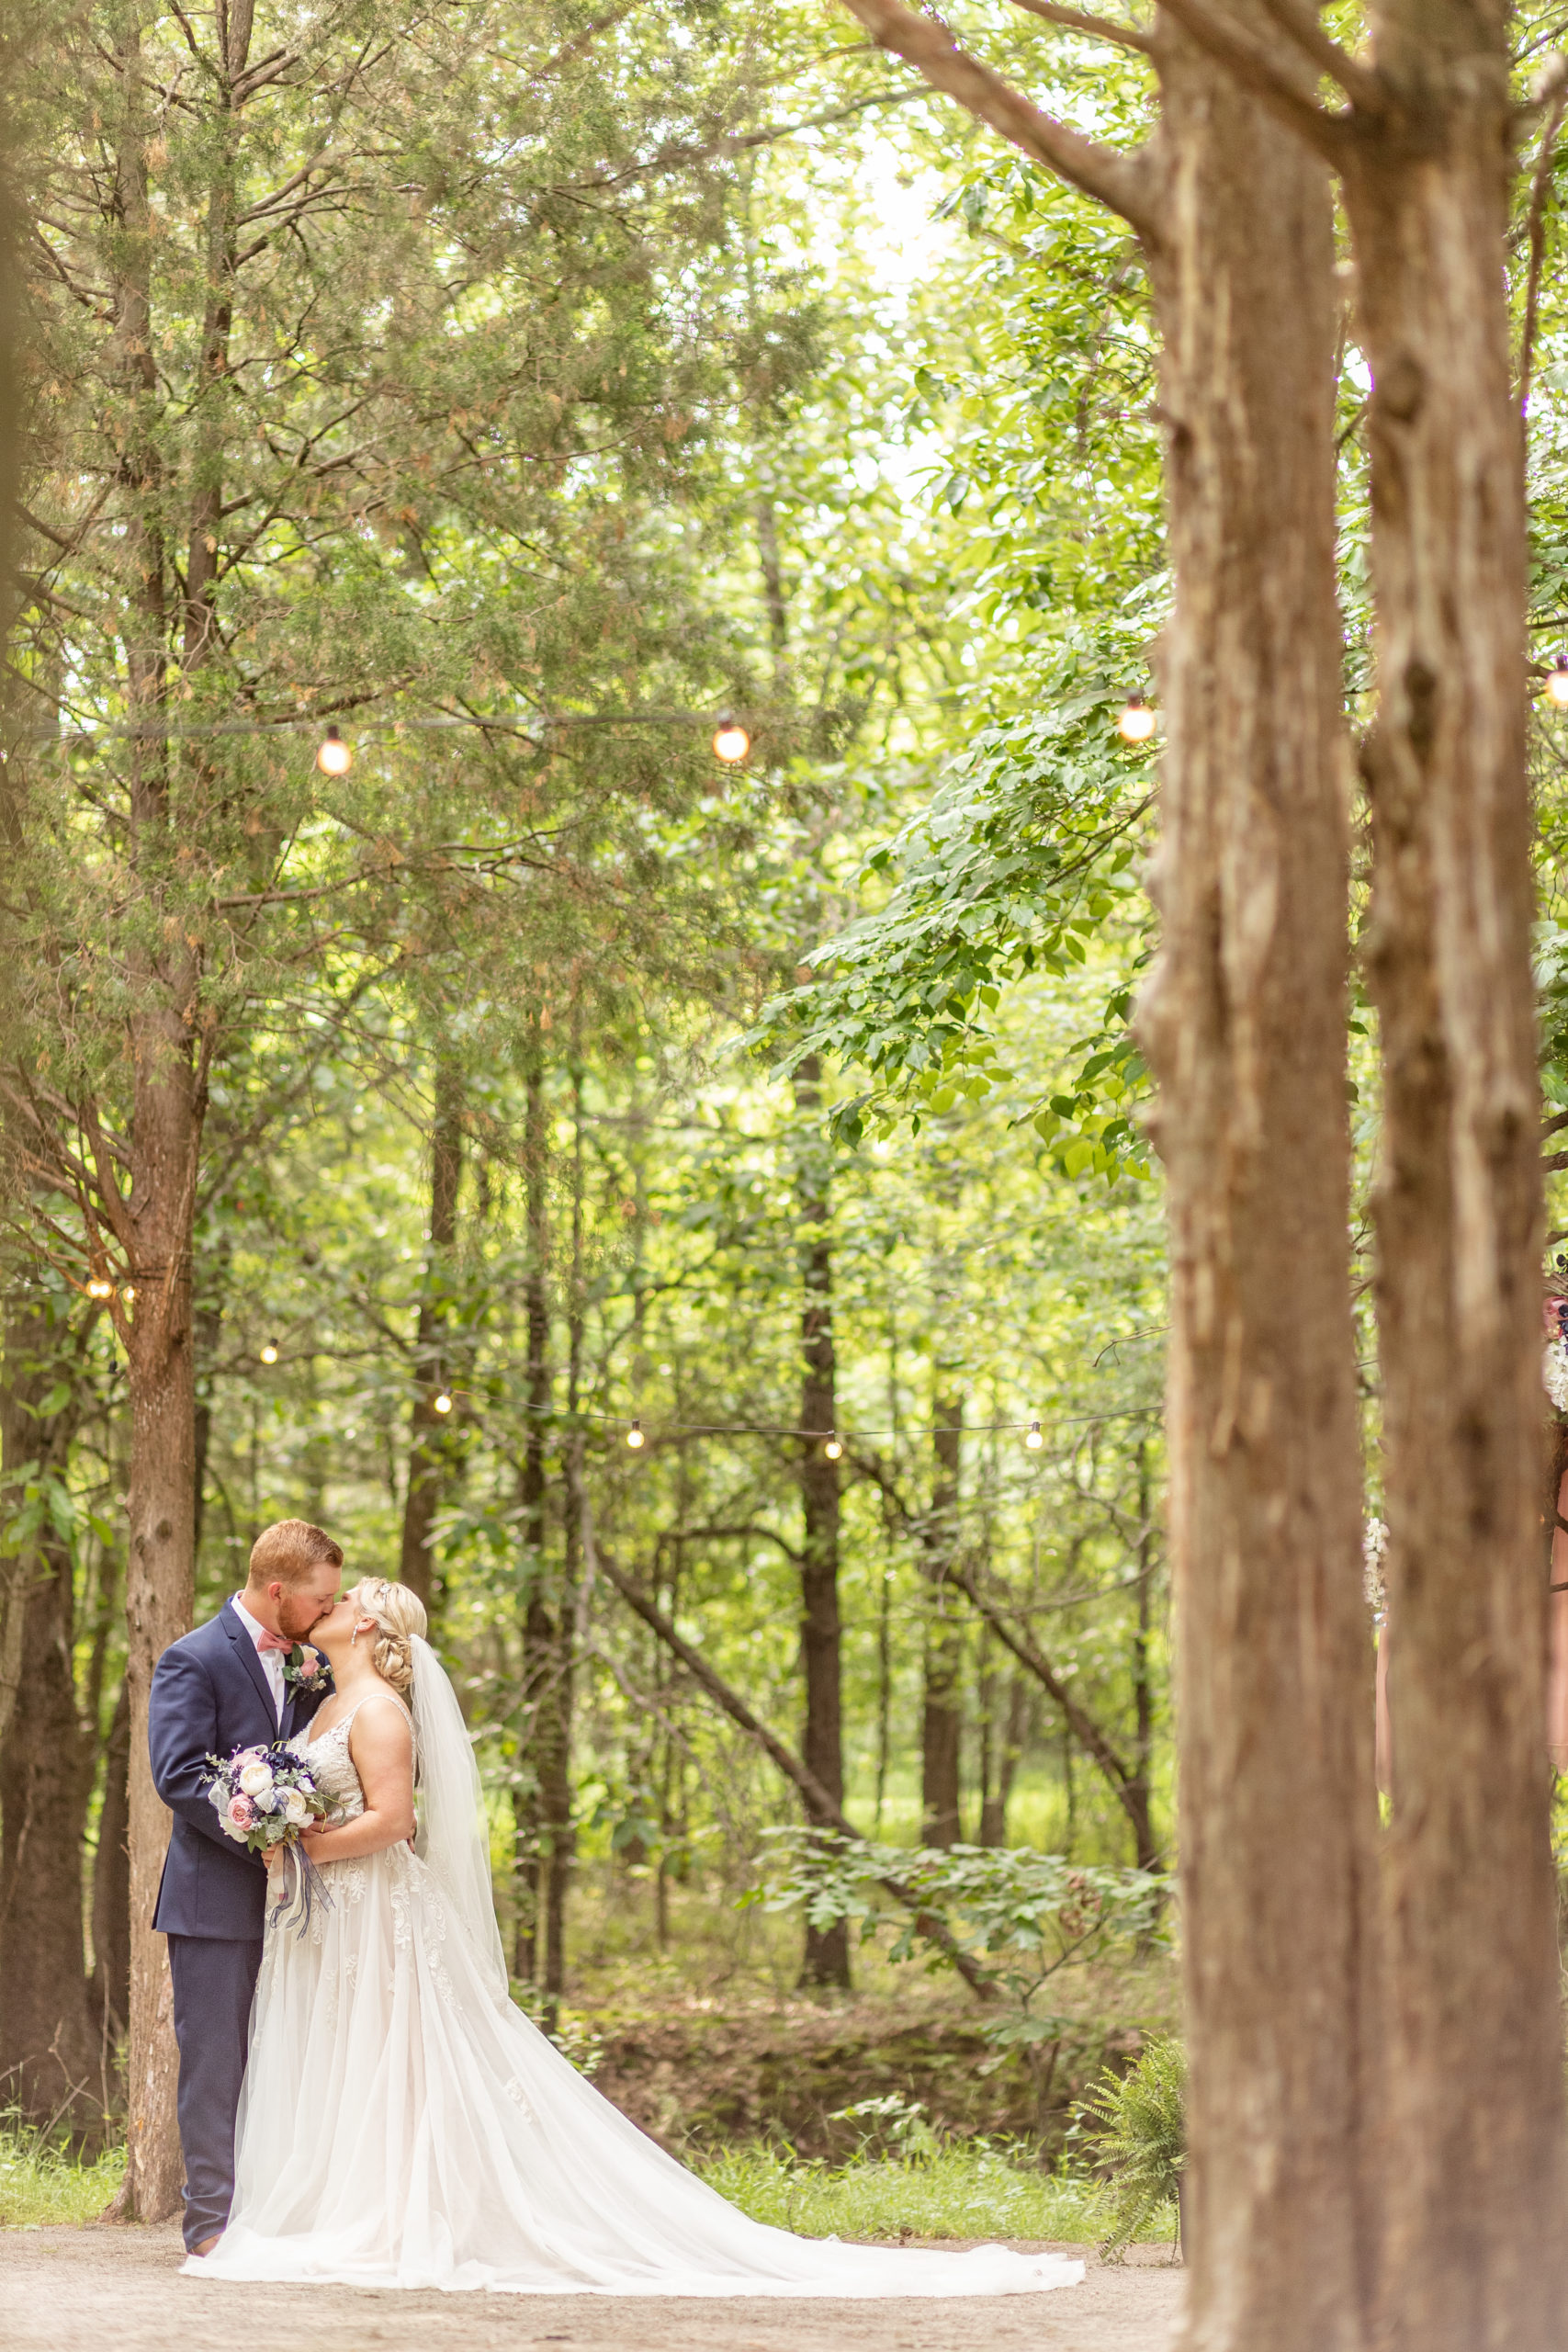 wooded wedding, bride and groom